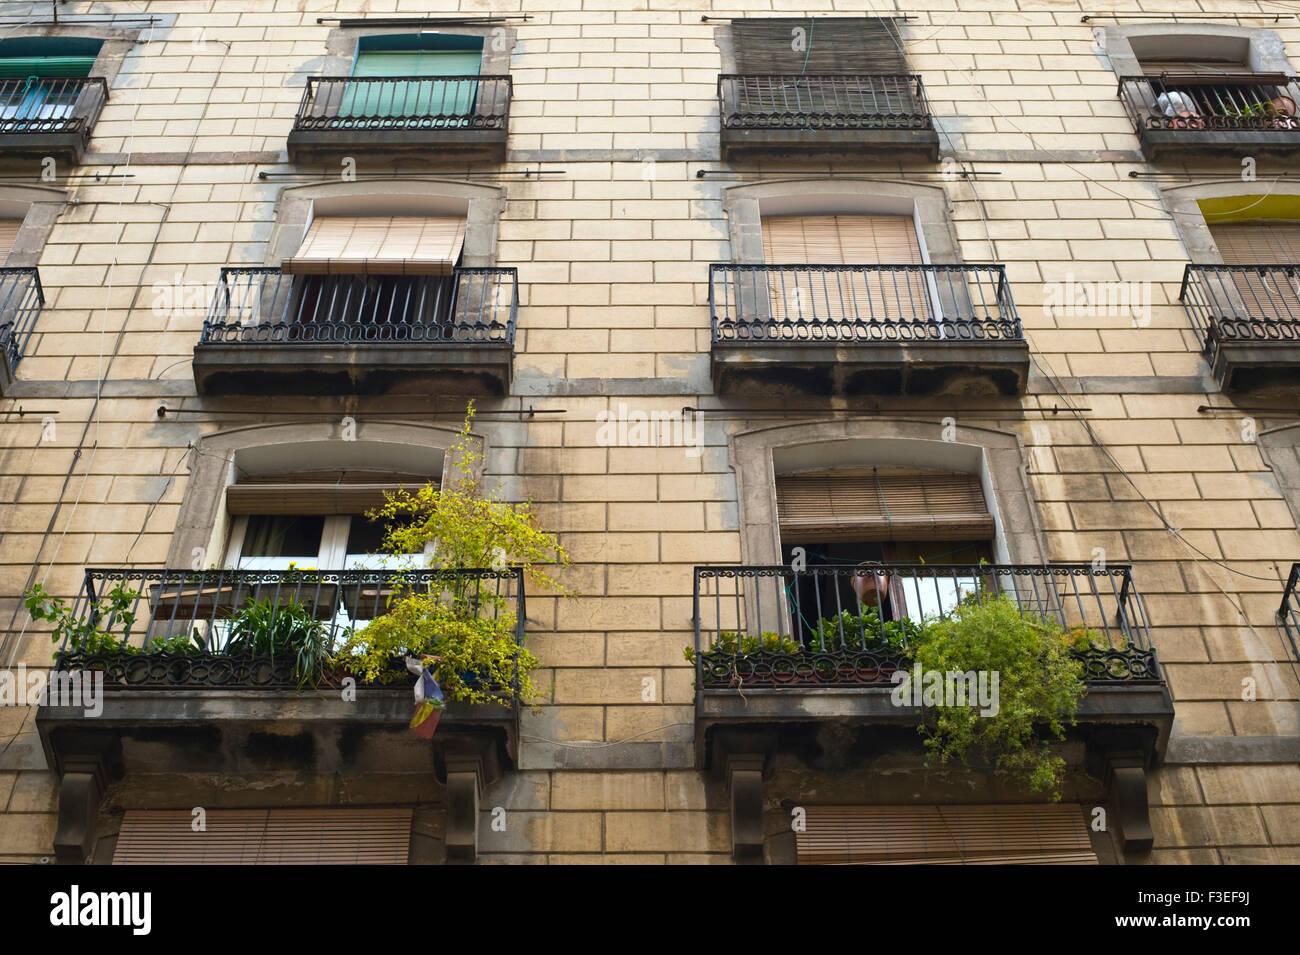 Spanish Window Wrought Iron Balcony Stock Photos Amp Spanish